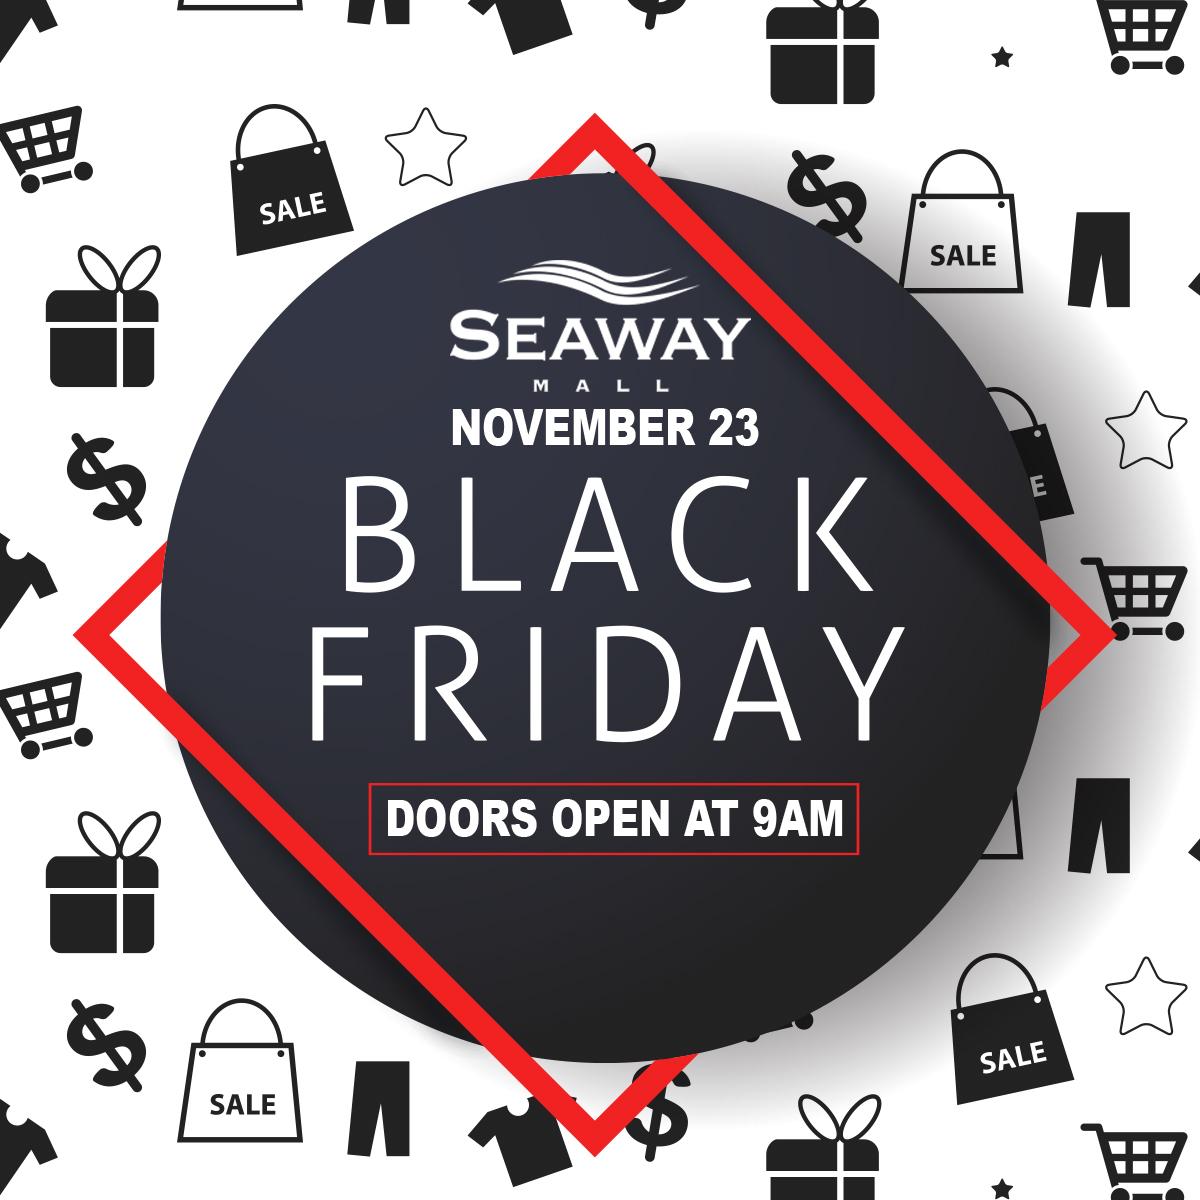 Seaway Mall: Black Friday